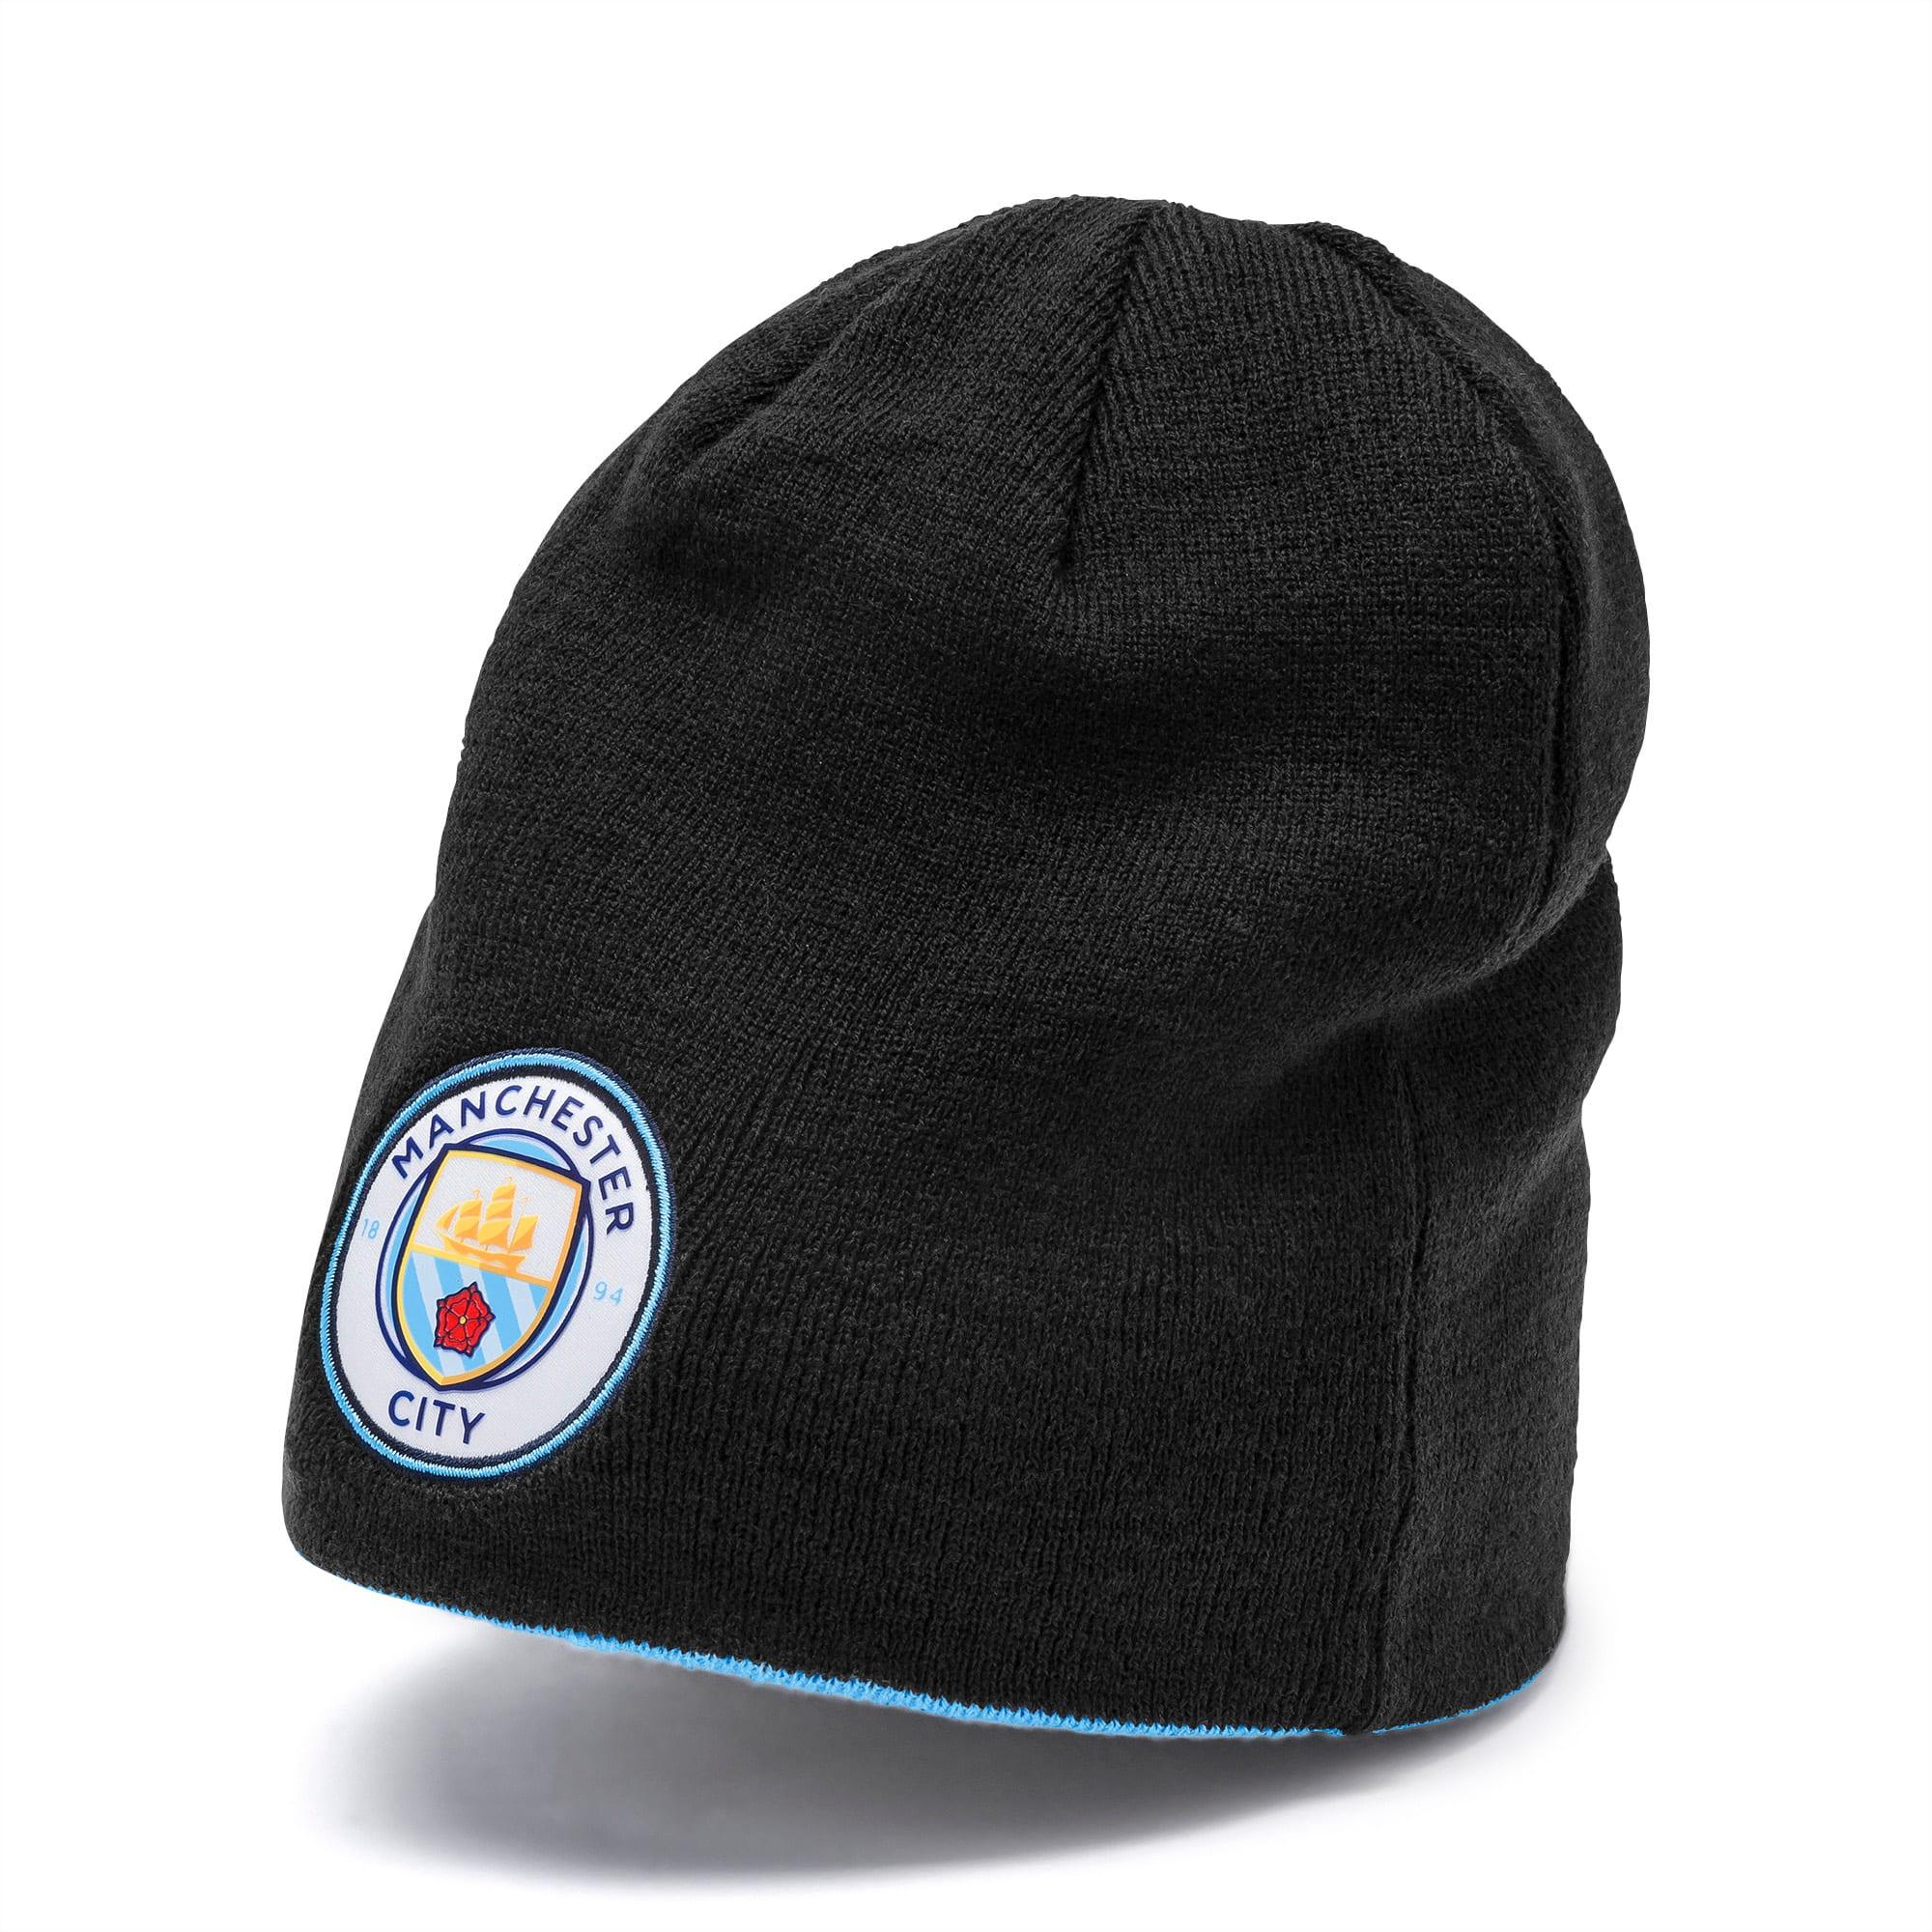 Man City Reversible Beanie | PUMA Manchester City